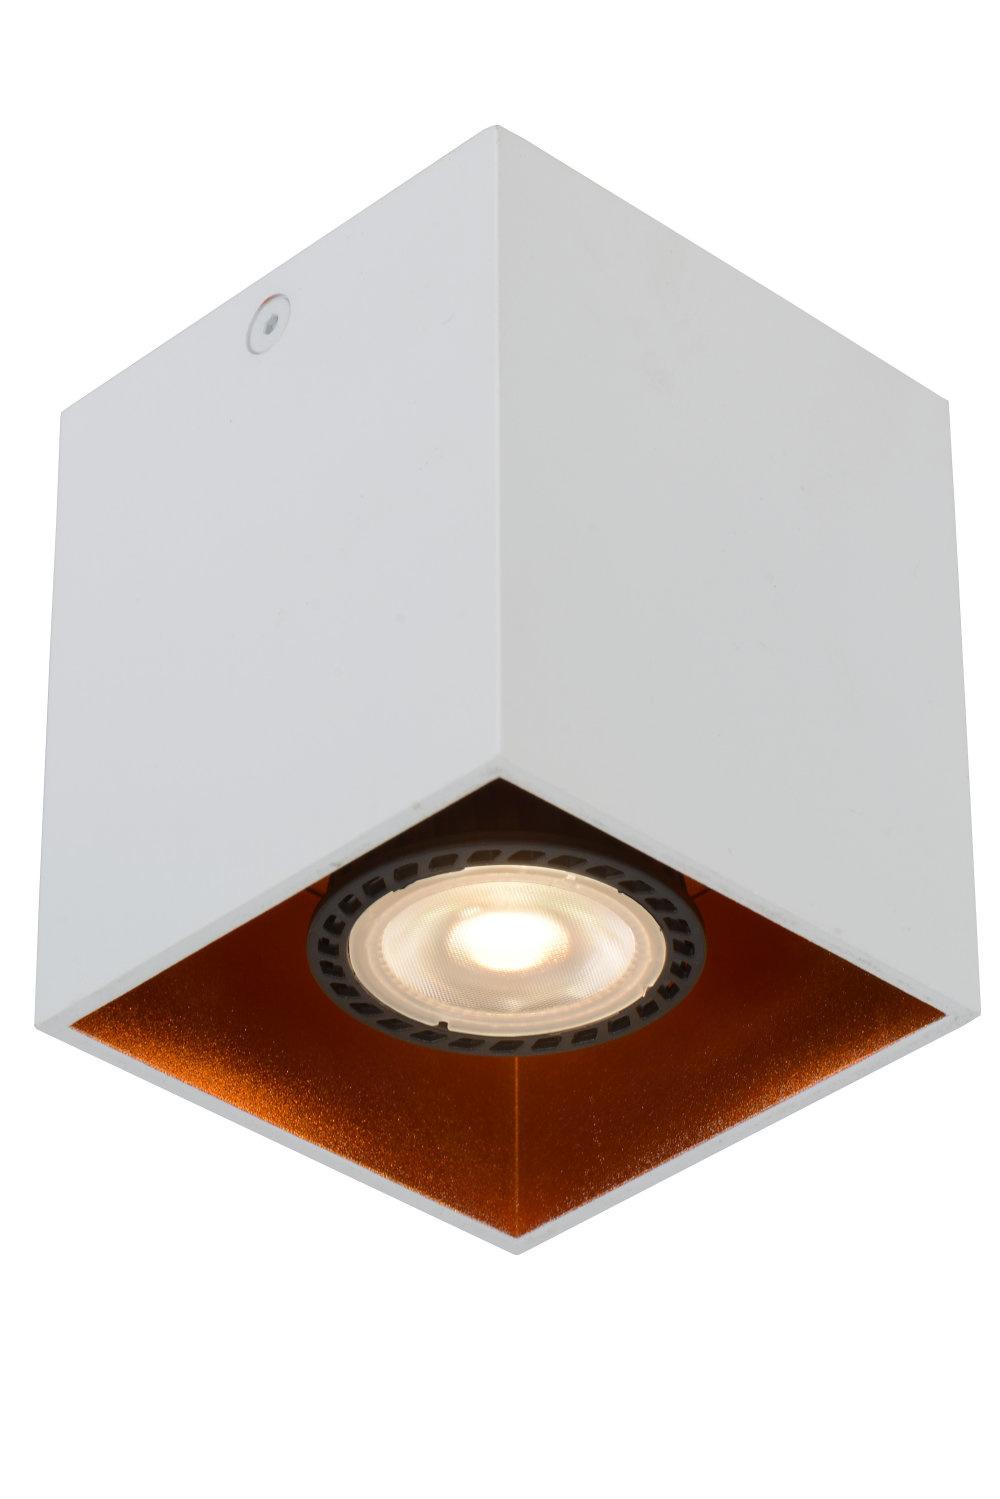 Lucide BIDO Plafondspot-Wit-1xGU10-50W-Alumin.